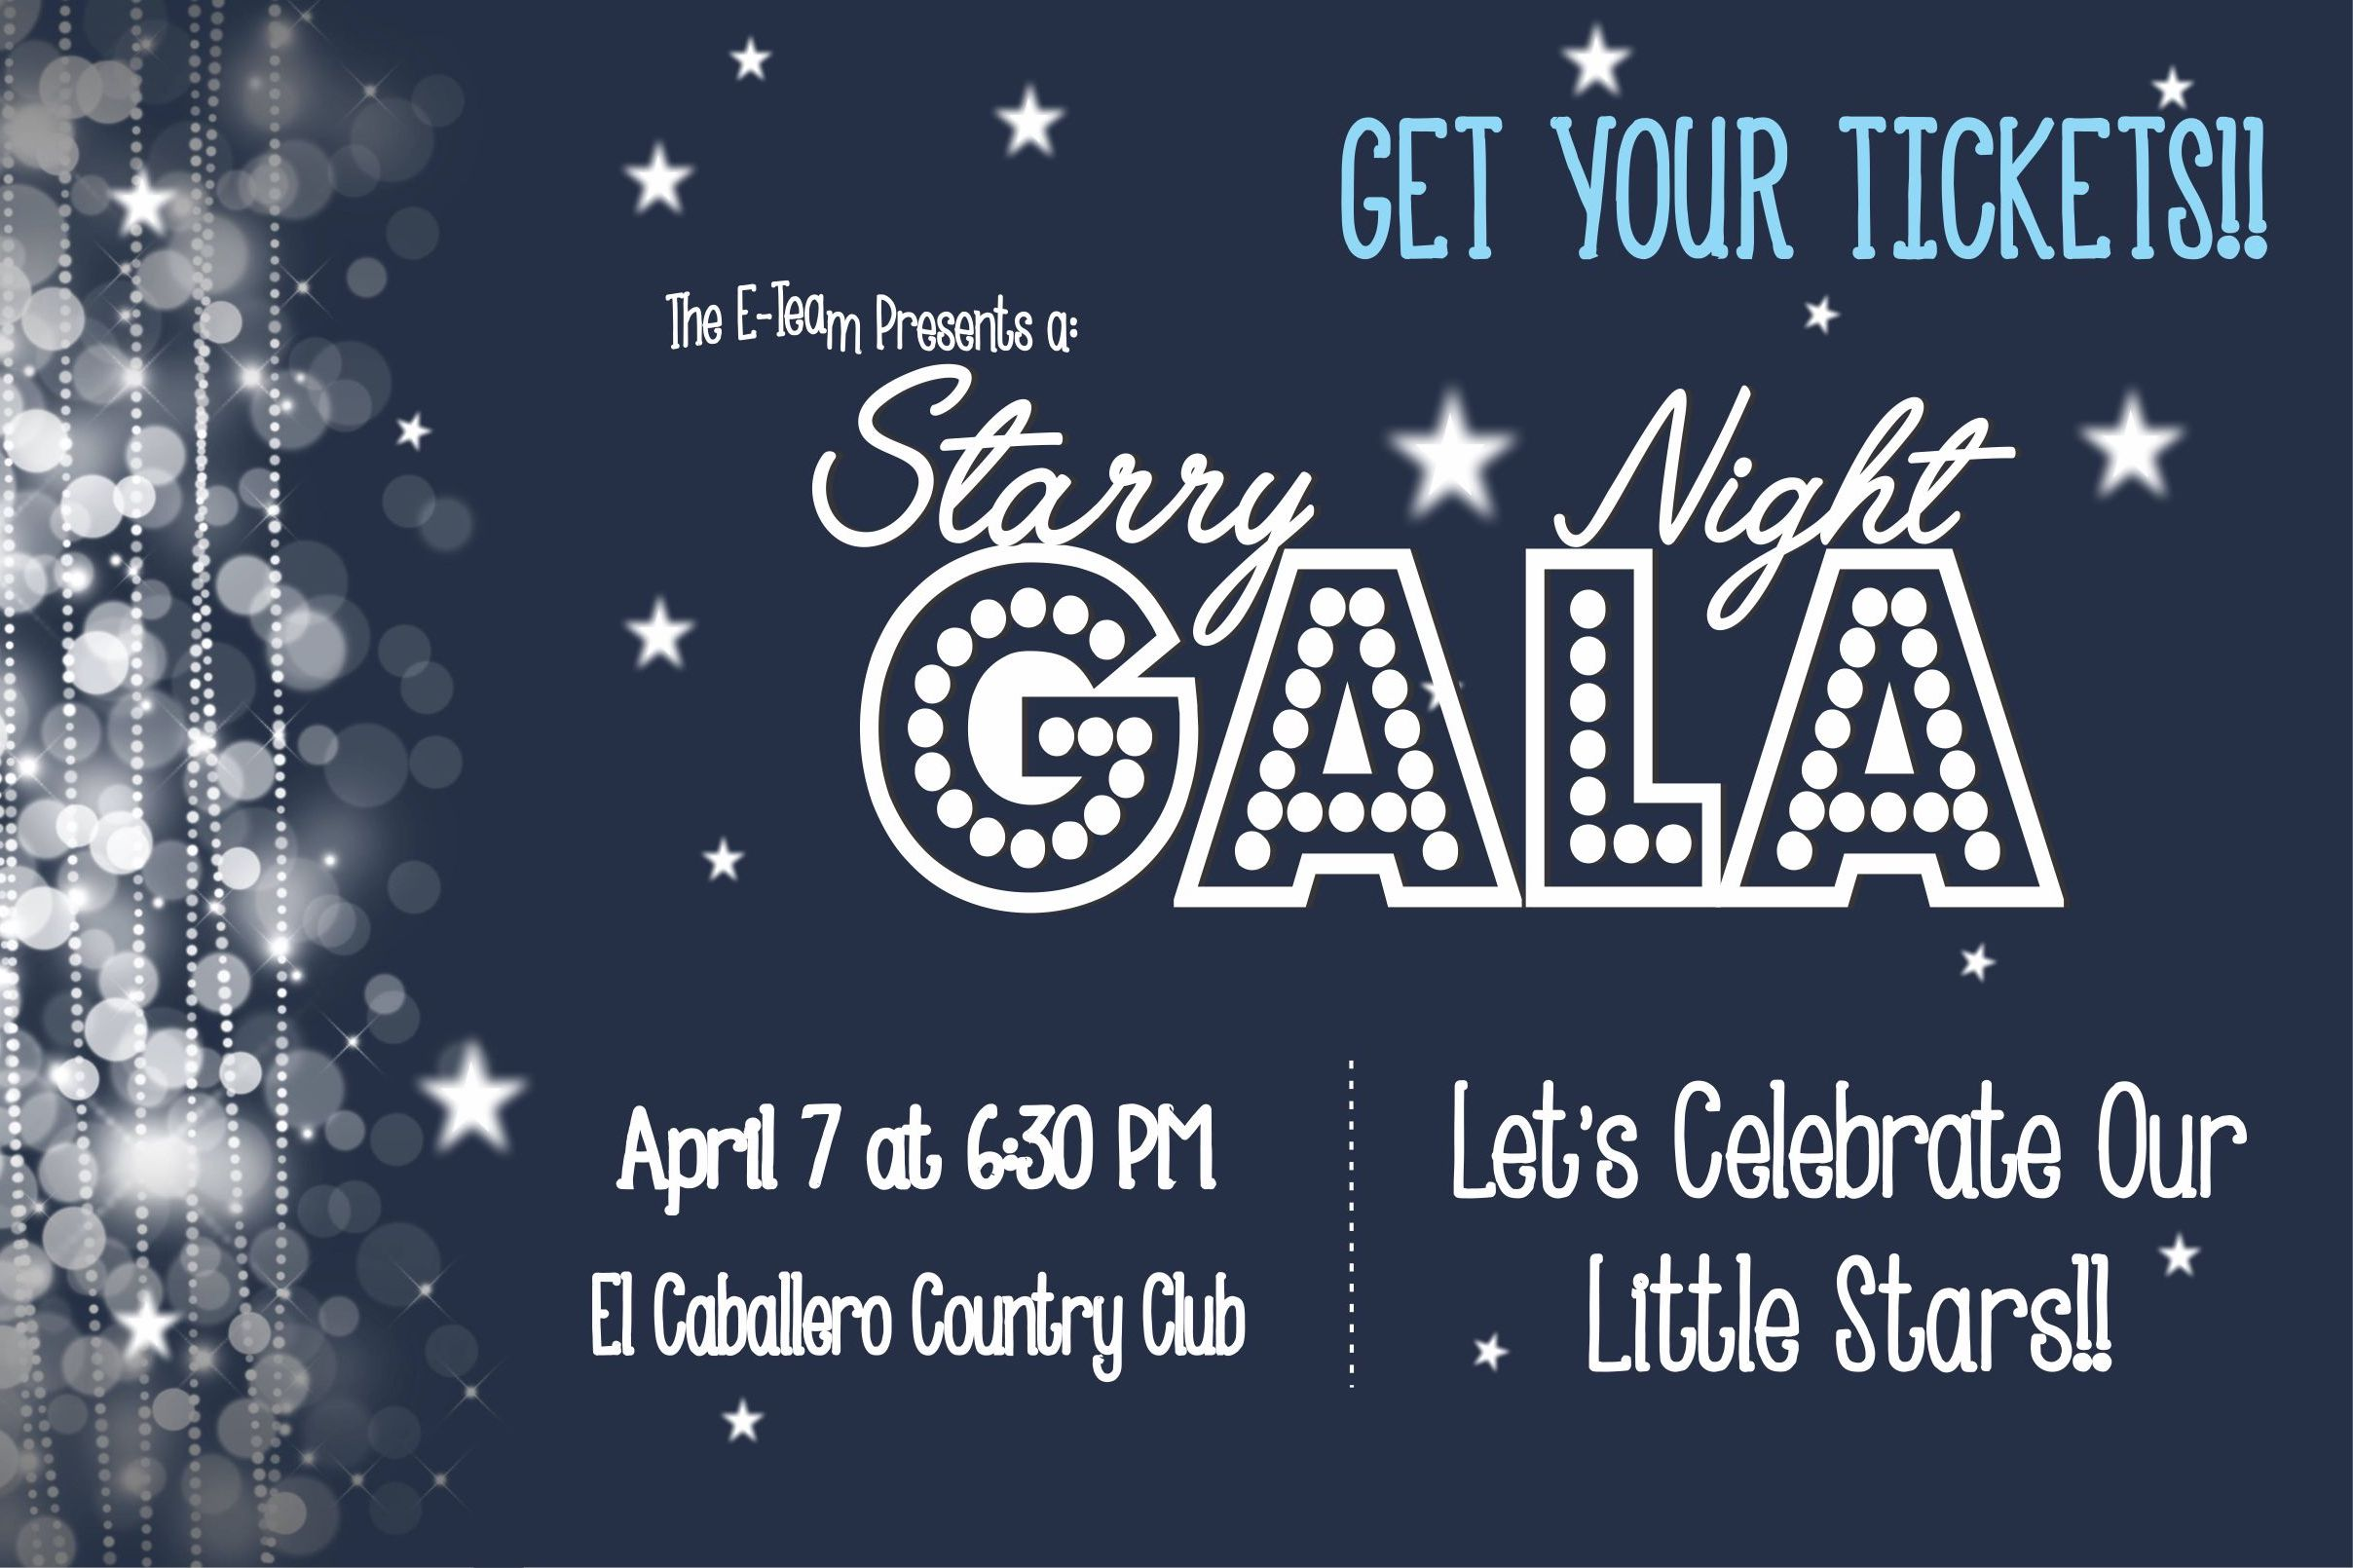 Starry Night Gala